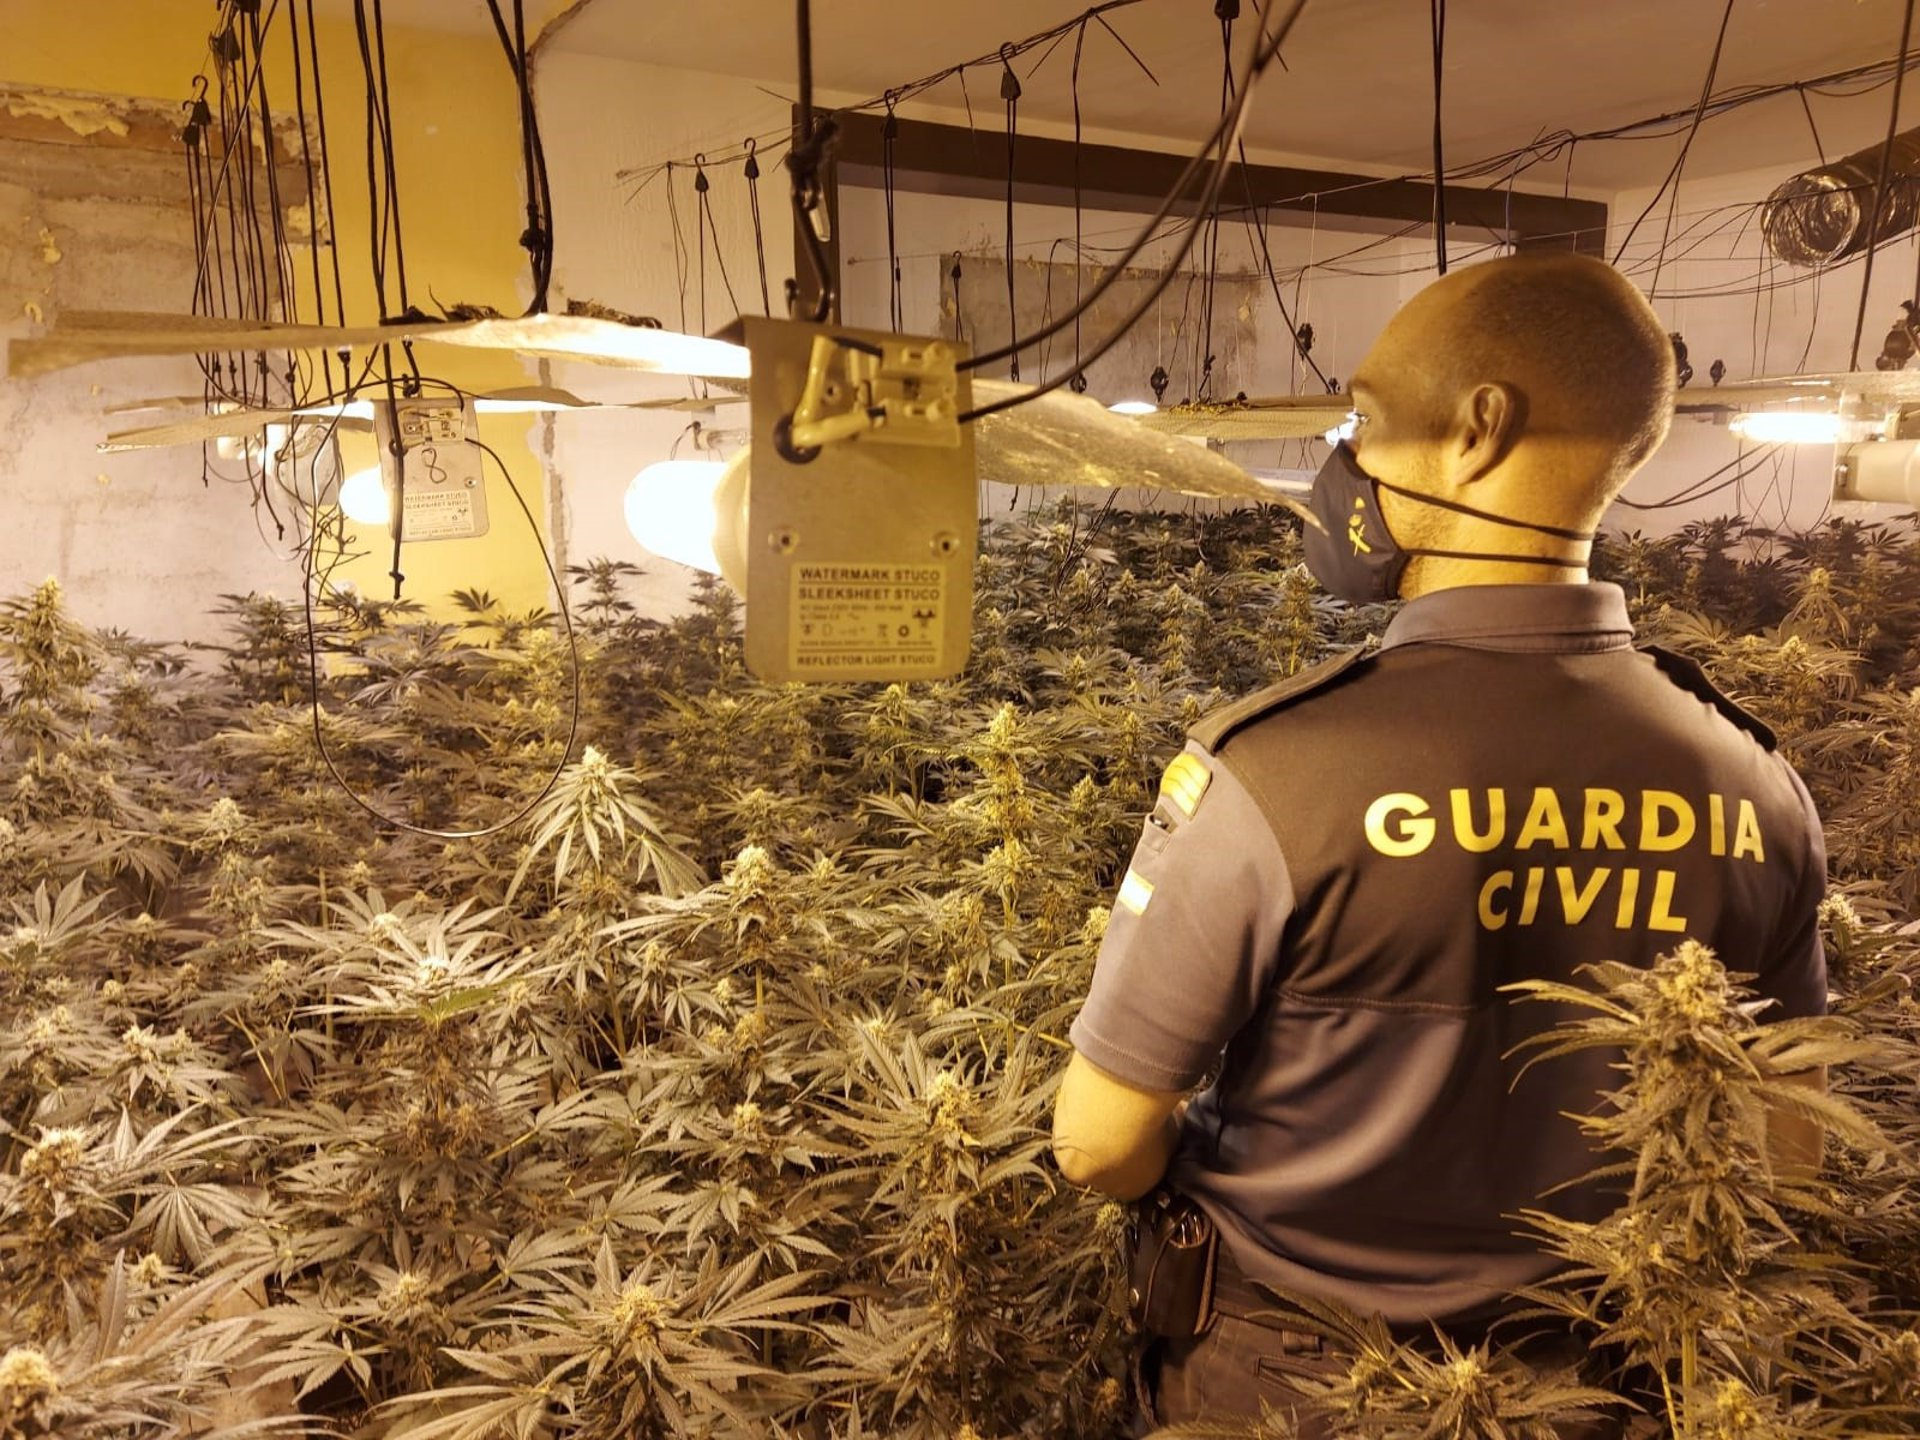 Incautadas 2.937 plantas de cannabis sativa en once centros de producción de marihuana